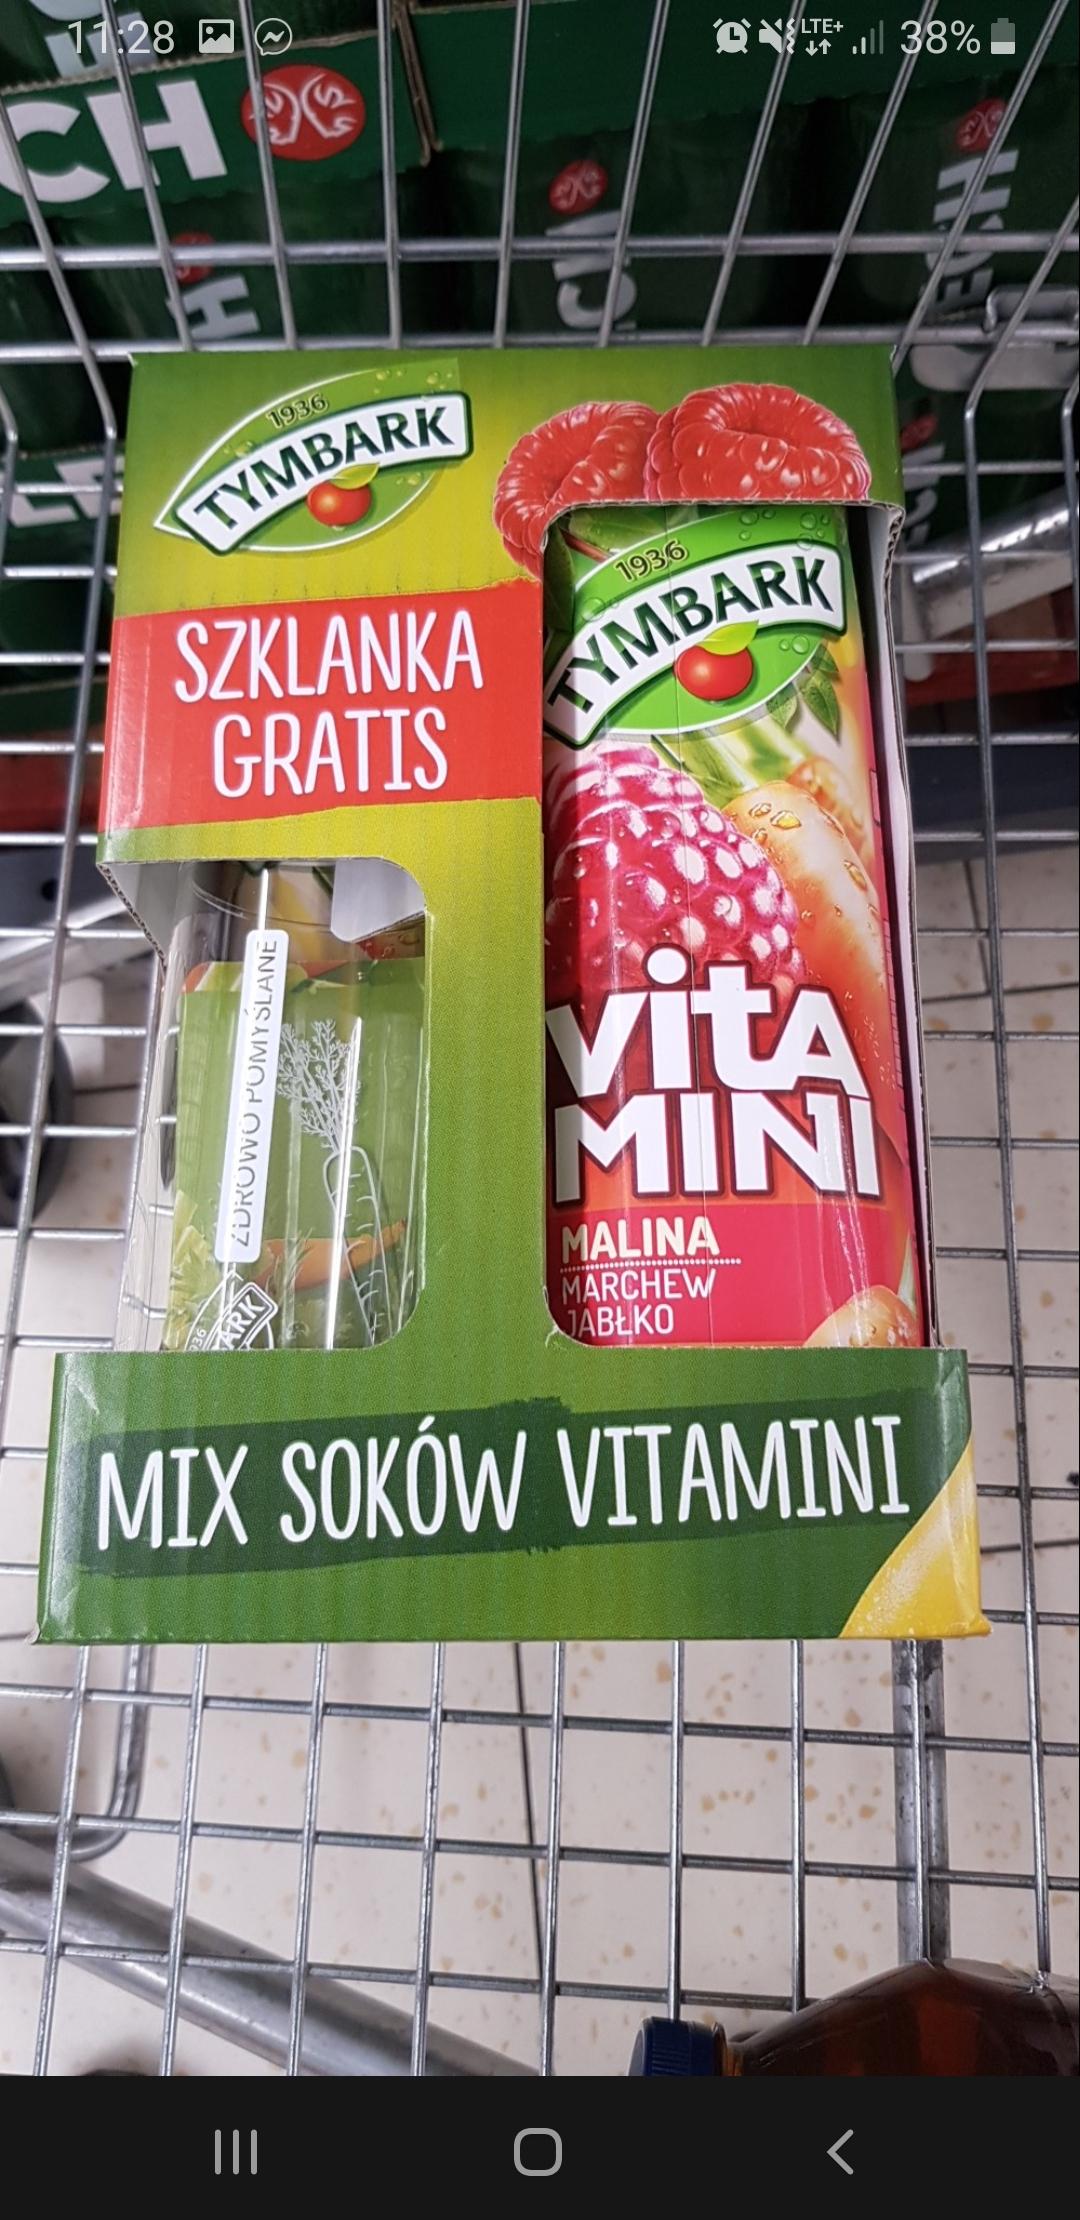 Lidl 3x sok 1l Tymbark Witamini + szklanka